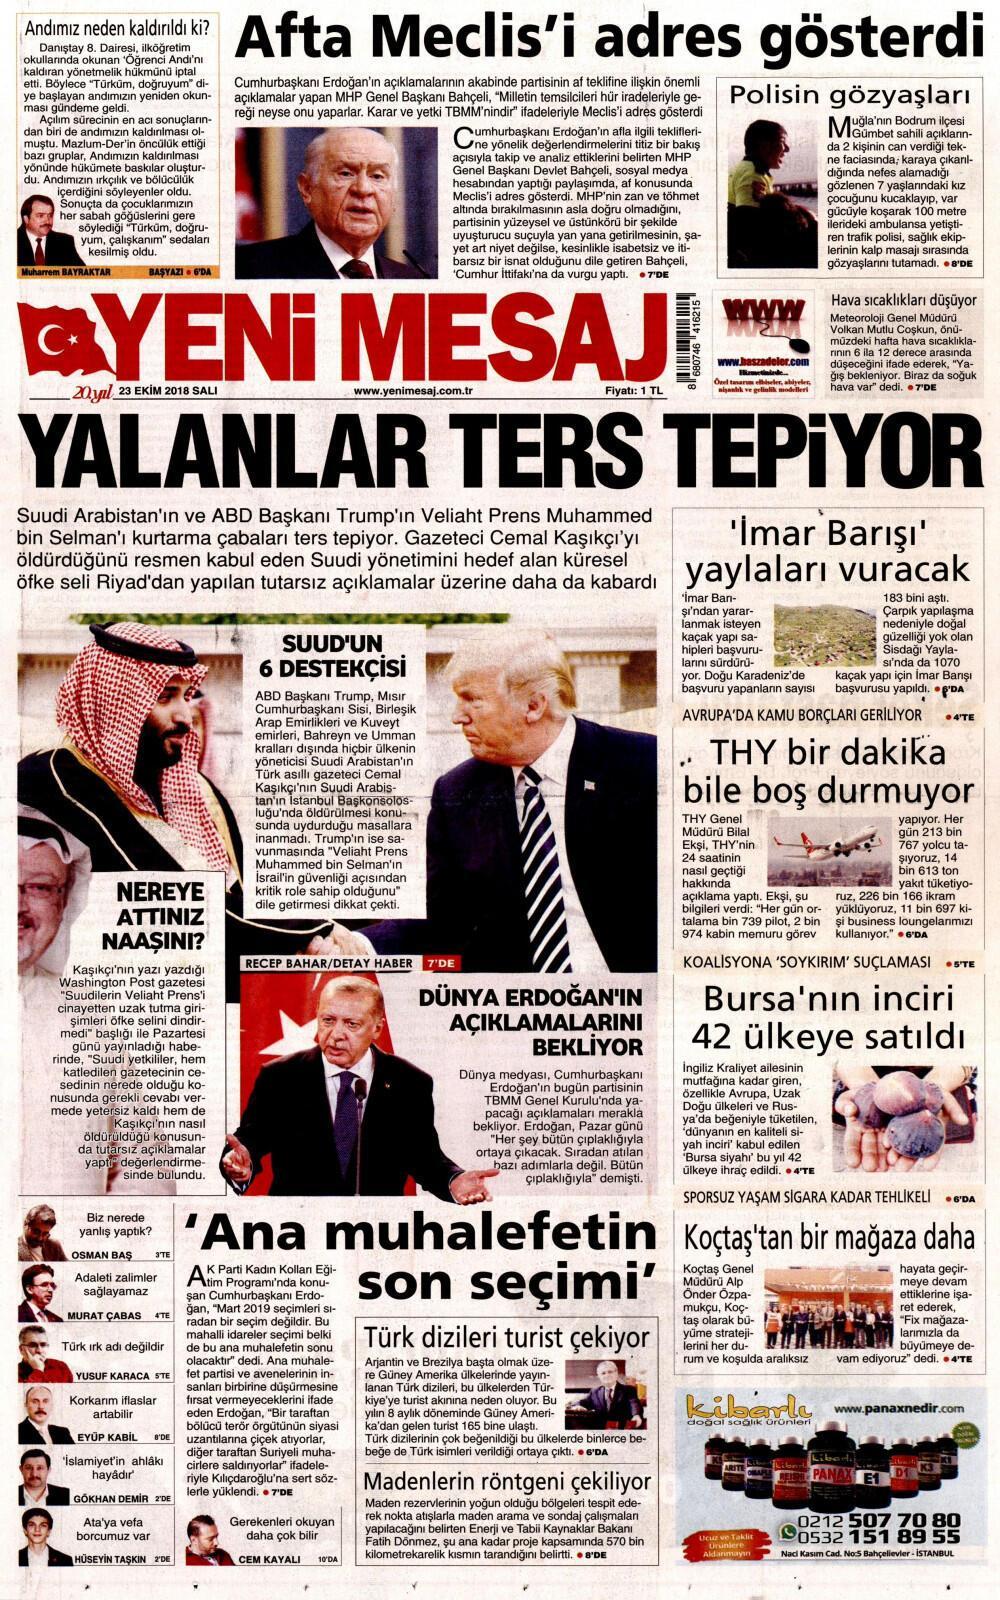 23 Ekim 2018 Gazete Manşetleri